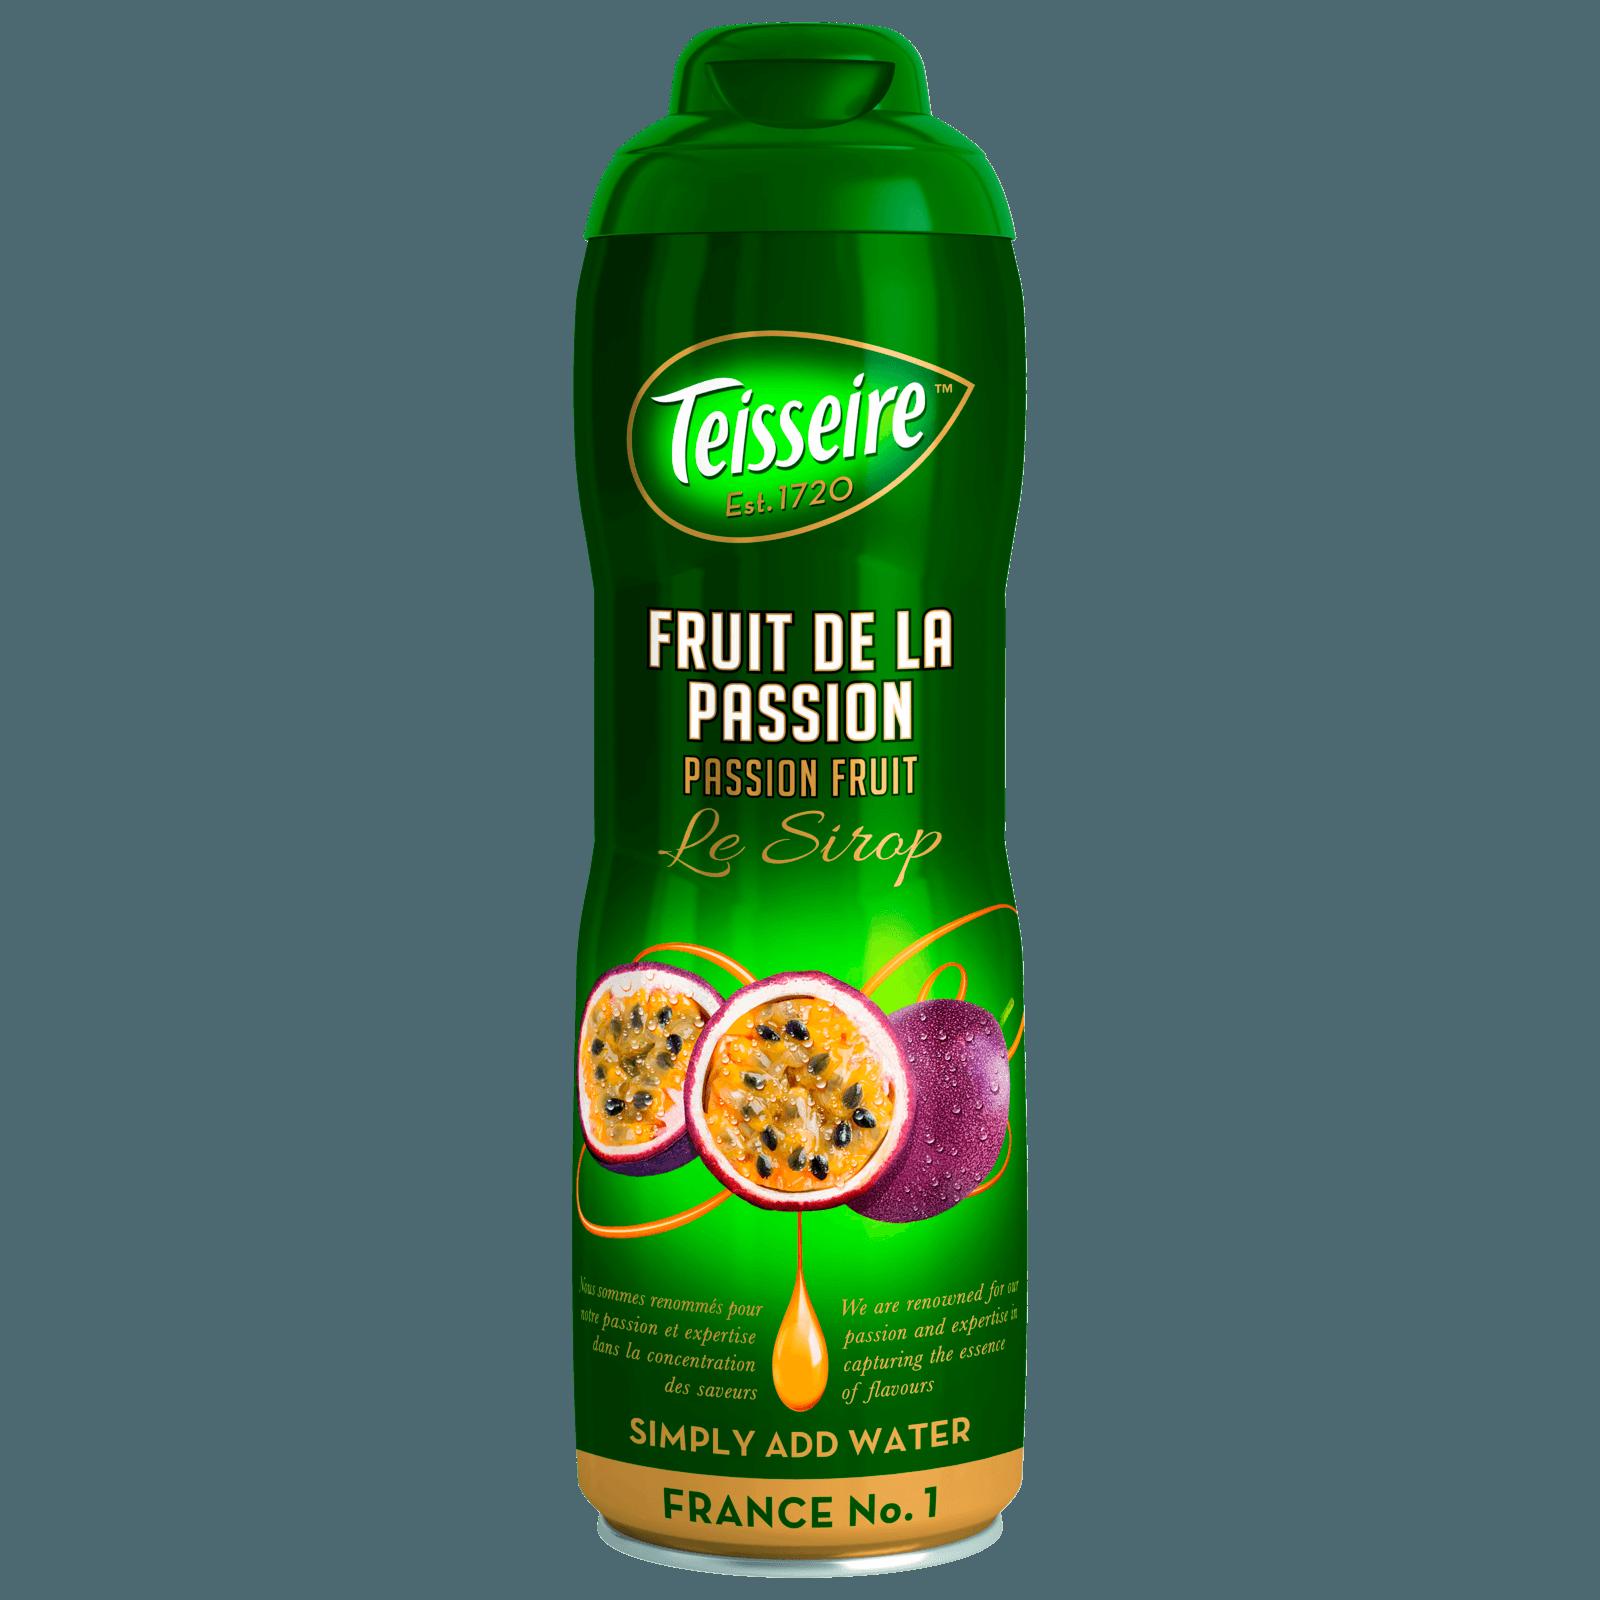 Teisseire Tropical Sirup 600ml bei REWE online bestellen!